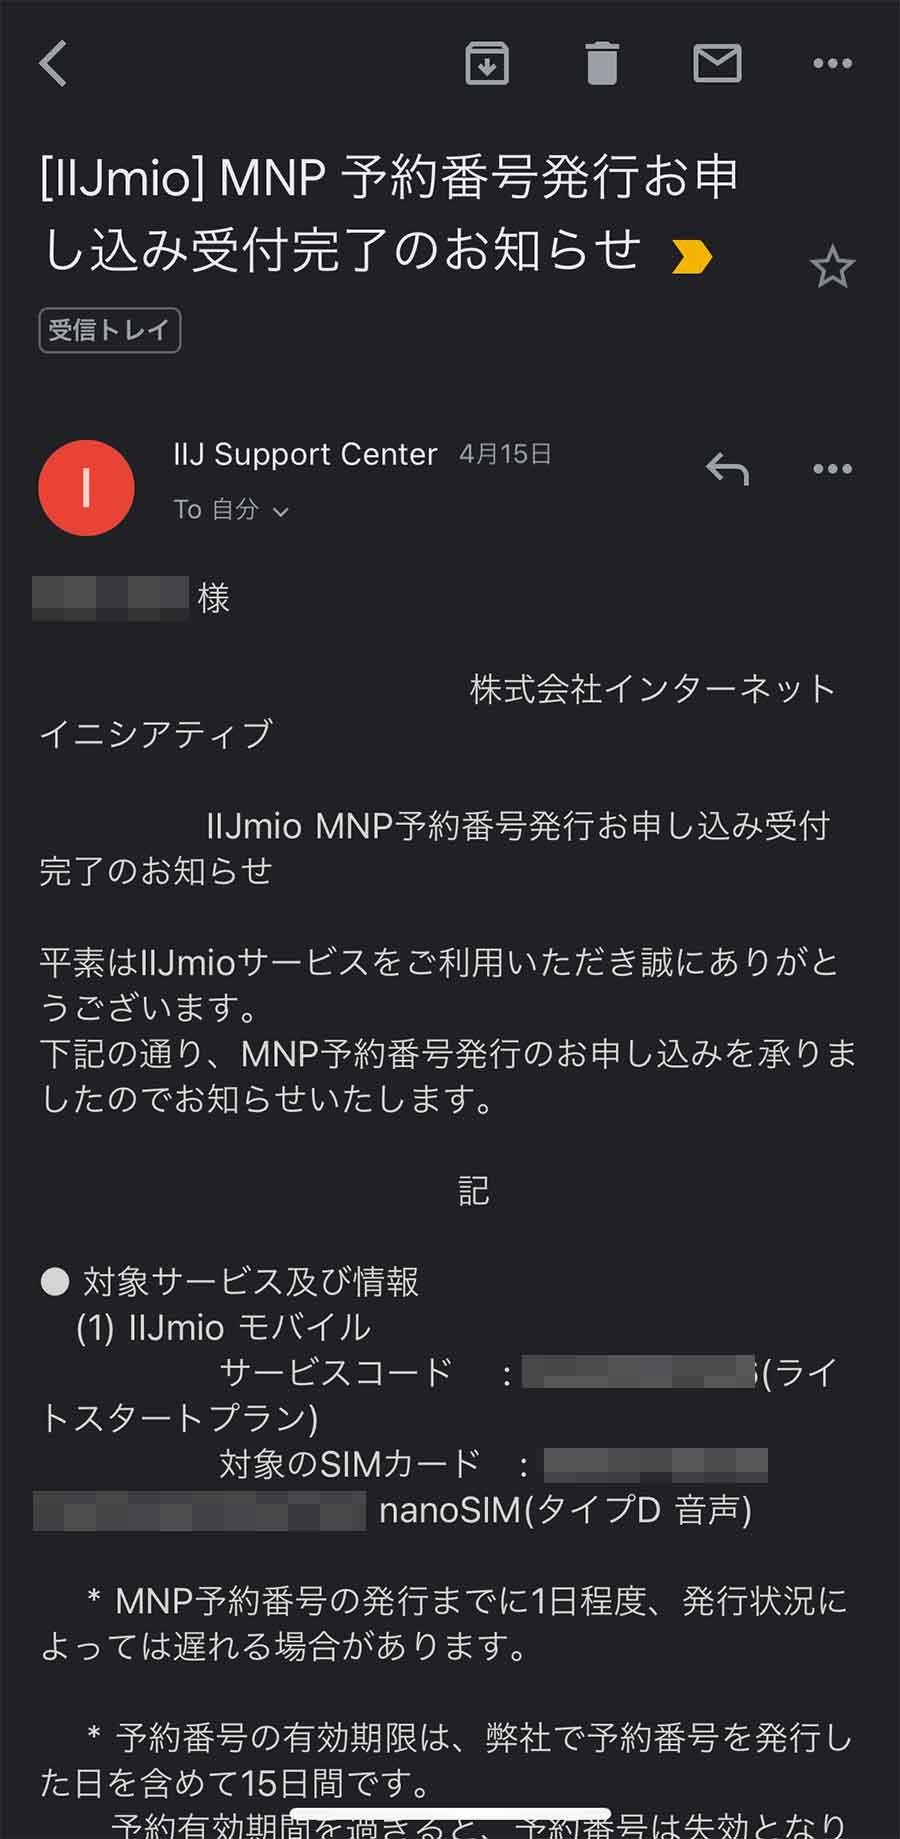 IIJmioのMNP予約番号発行確認メール